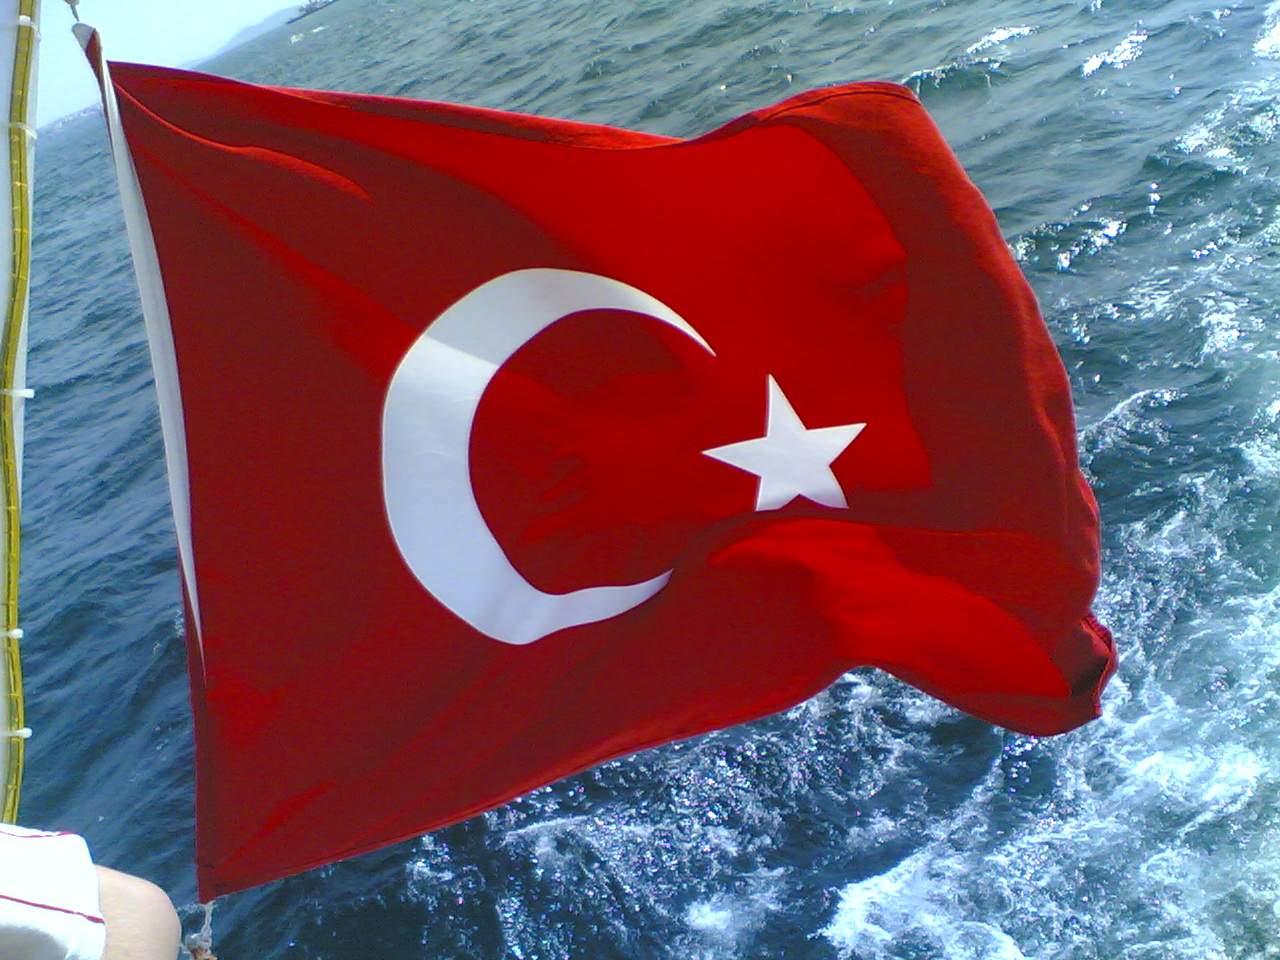 Участники путча в Турции захватили фрегат и взяли в заложники командующего ВМС